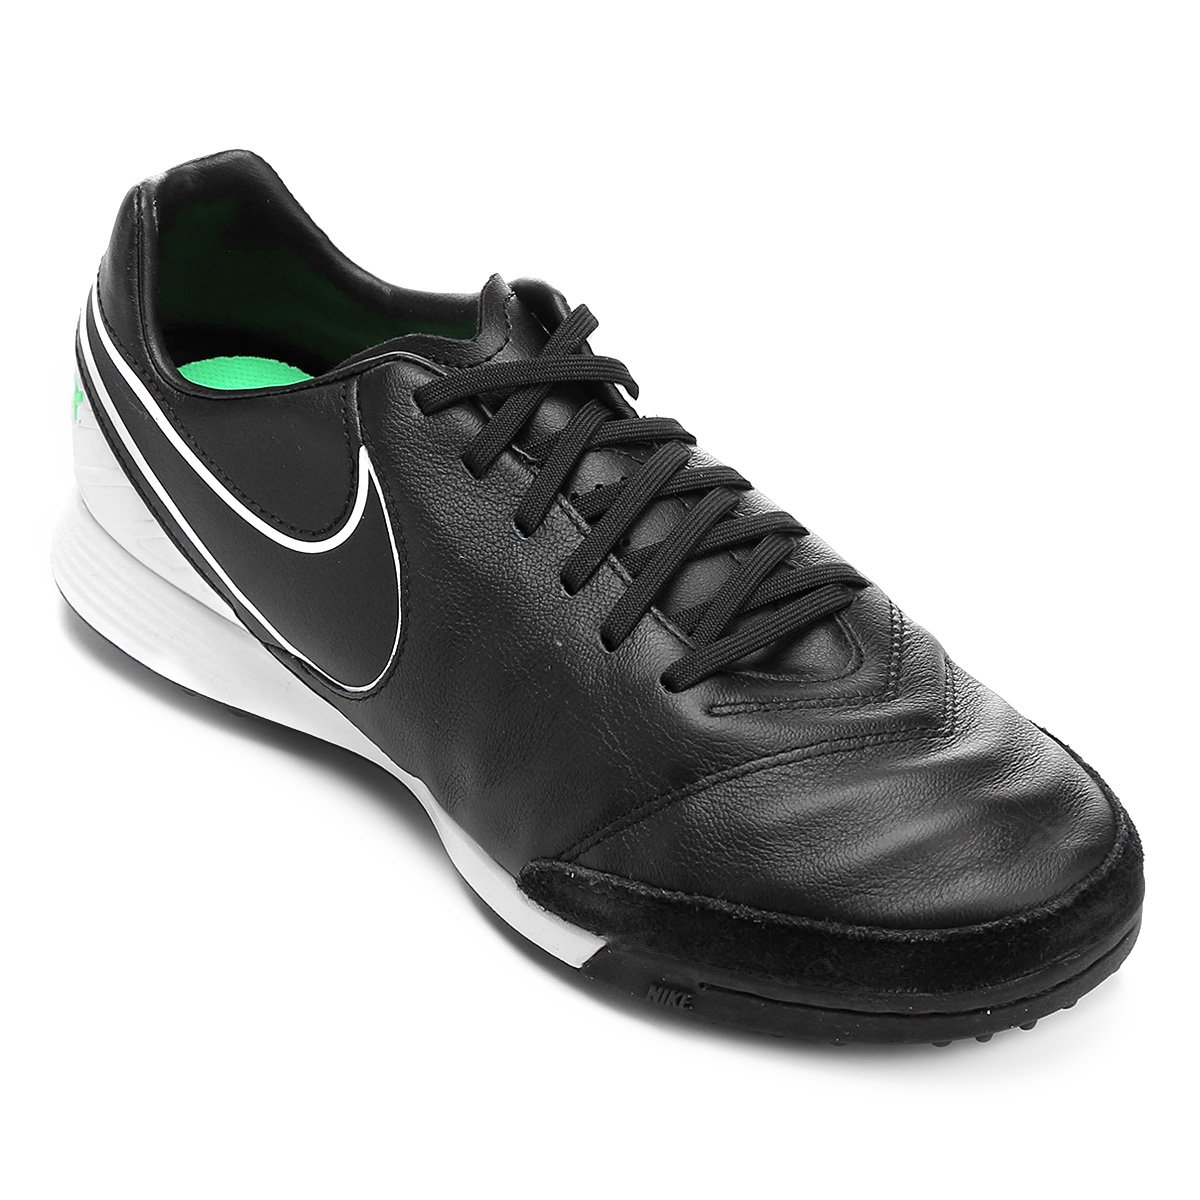 4ed7d631a888d Chuteira Society Nike Tiempo Mystic 5 TF - Preto e verde - Compre Agora